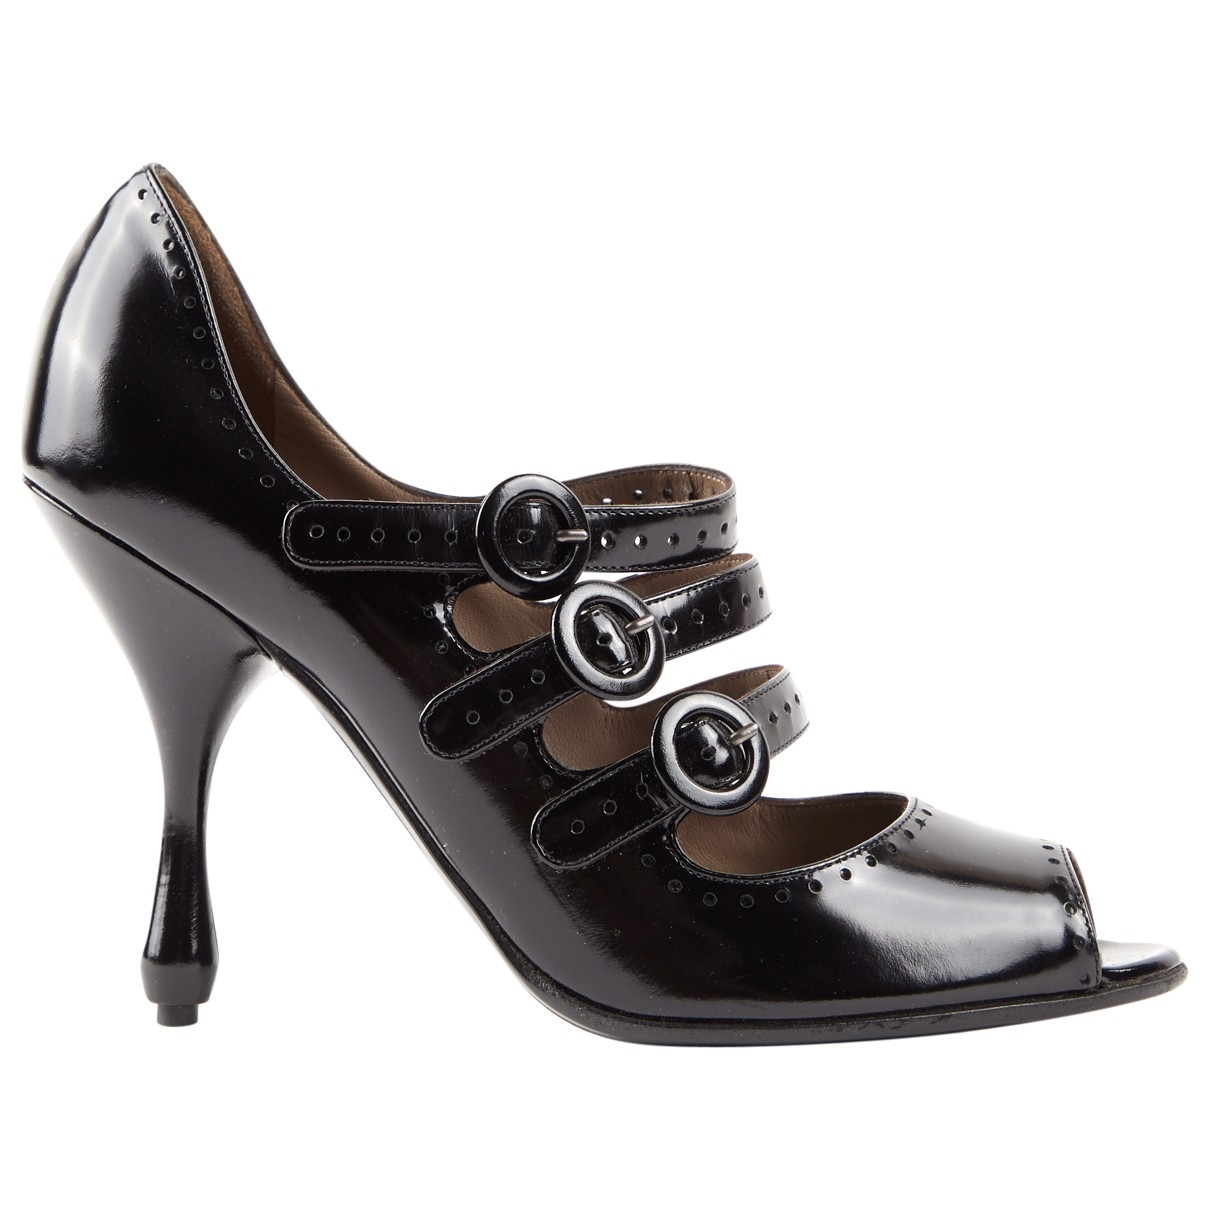 Bottega Veneta \N Black Patent leather Heels for Women 37.5 EU